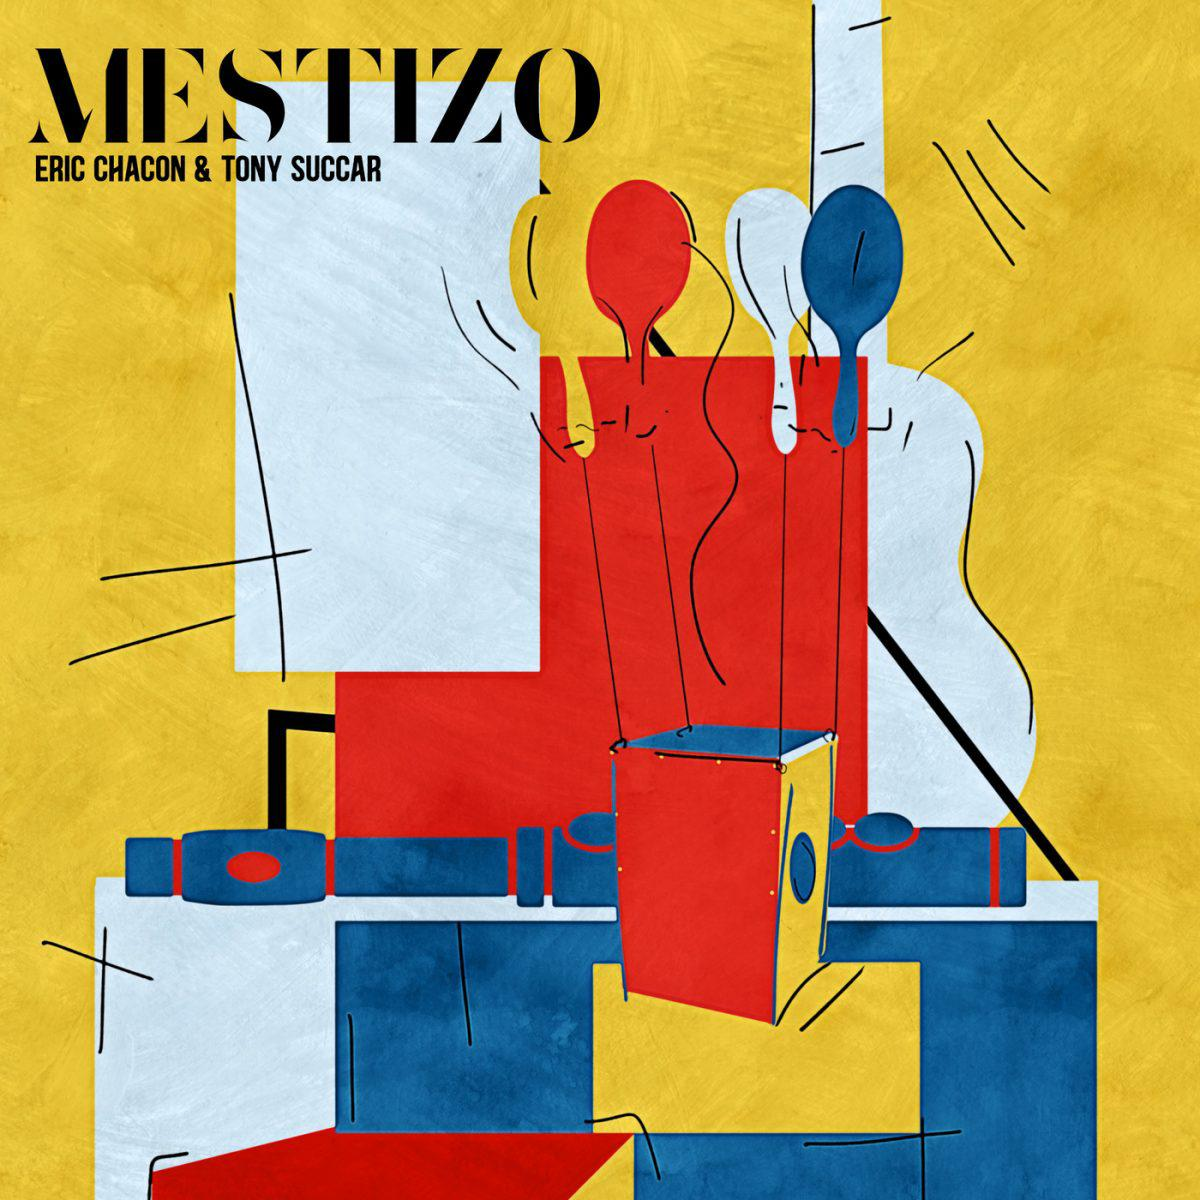 Mestizo - Eric Chacón & Tony Succar